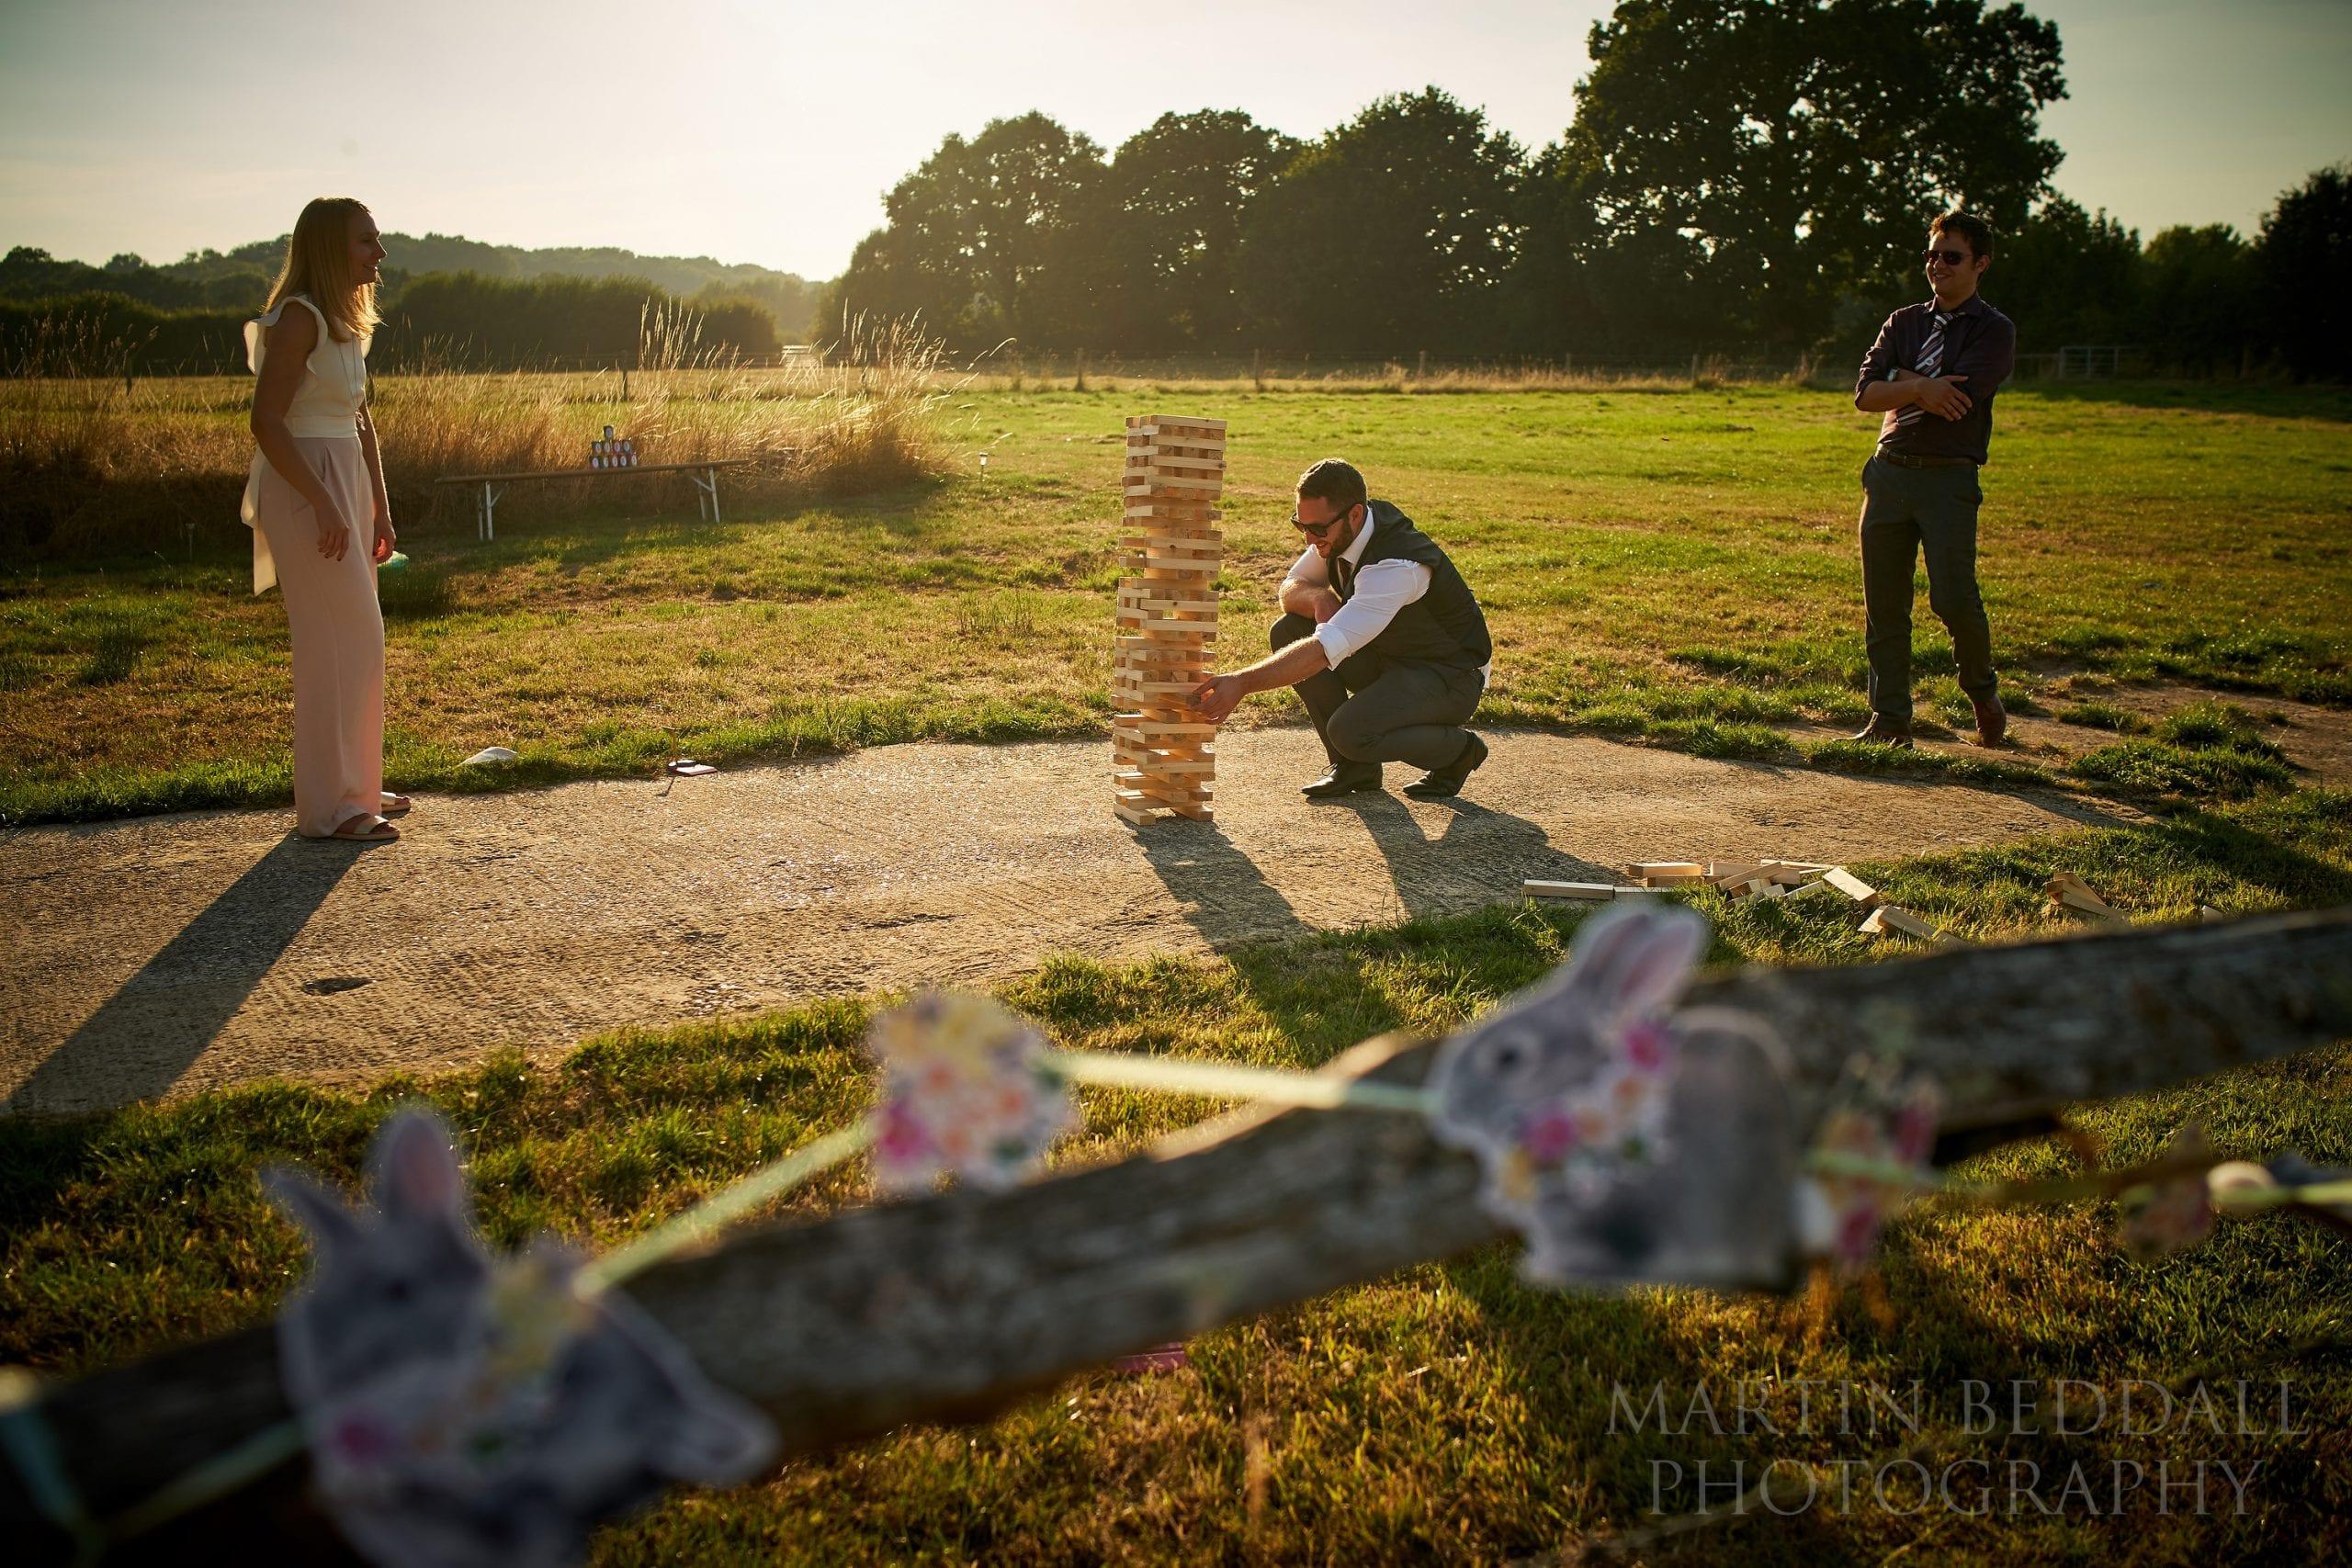 Summer evening wedding games